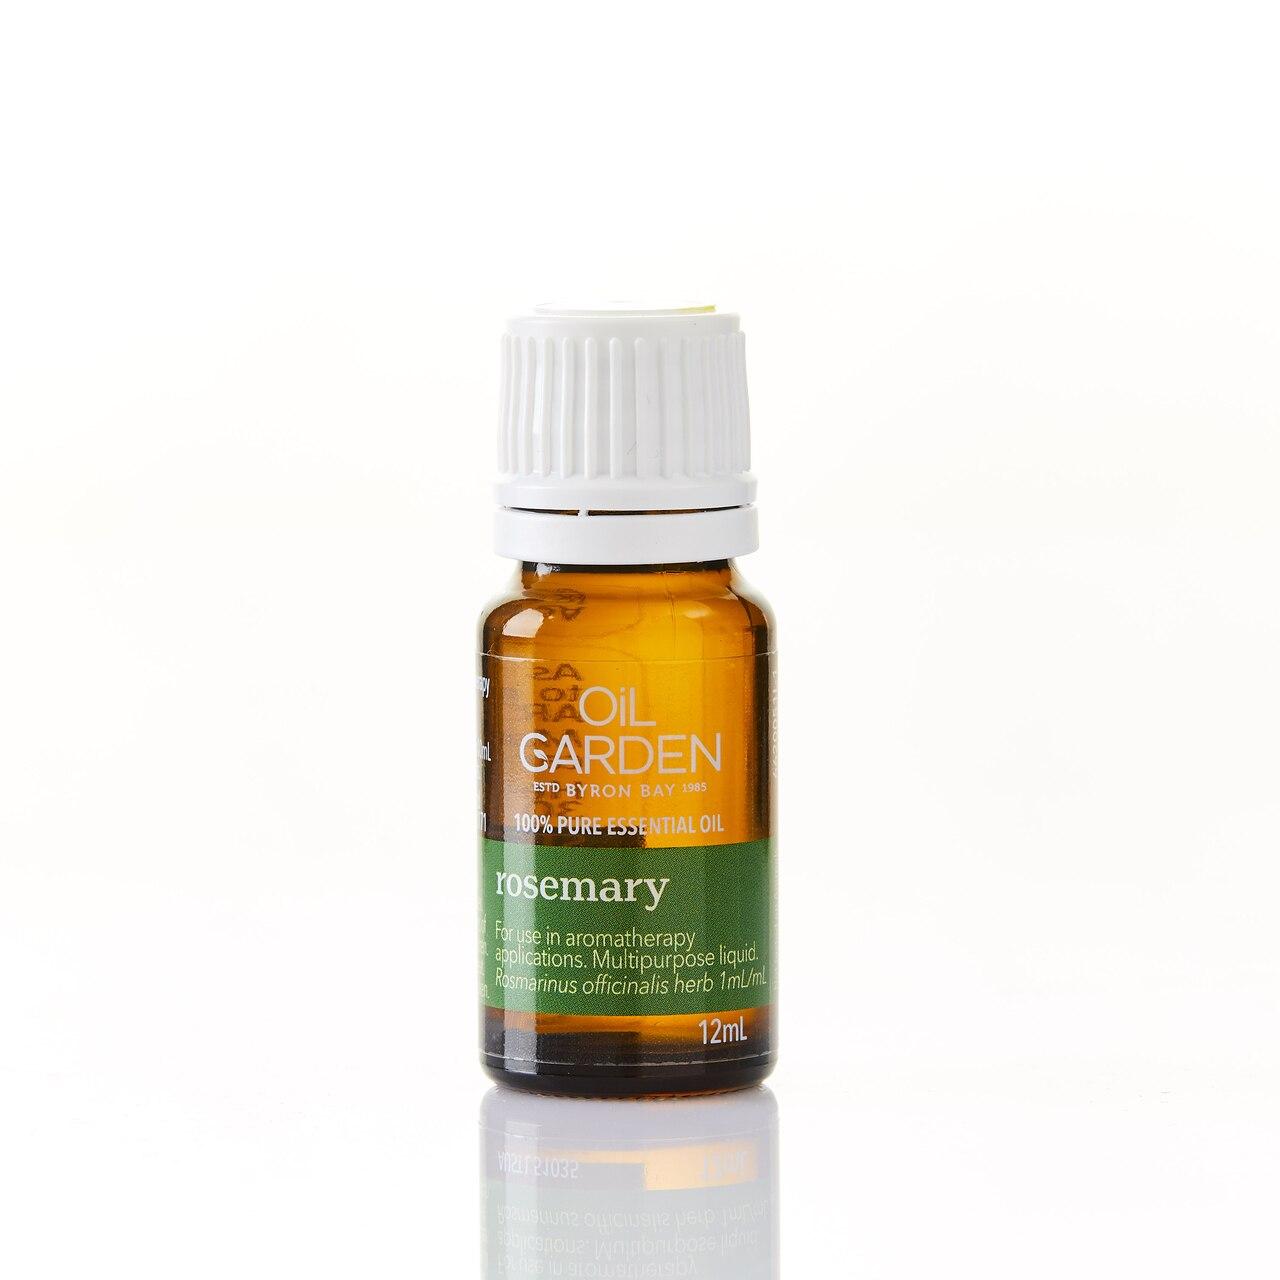 Oil Garden Rosemary Pure Essential Oil 12mL 6620051